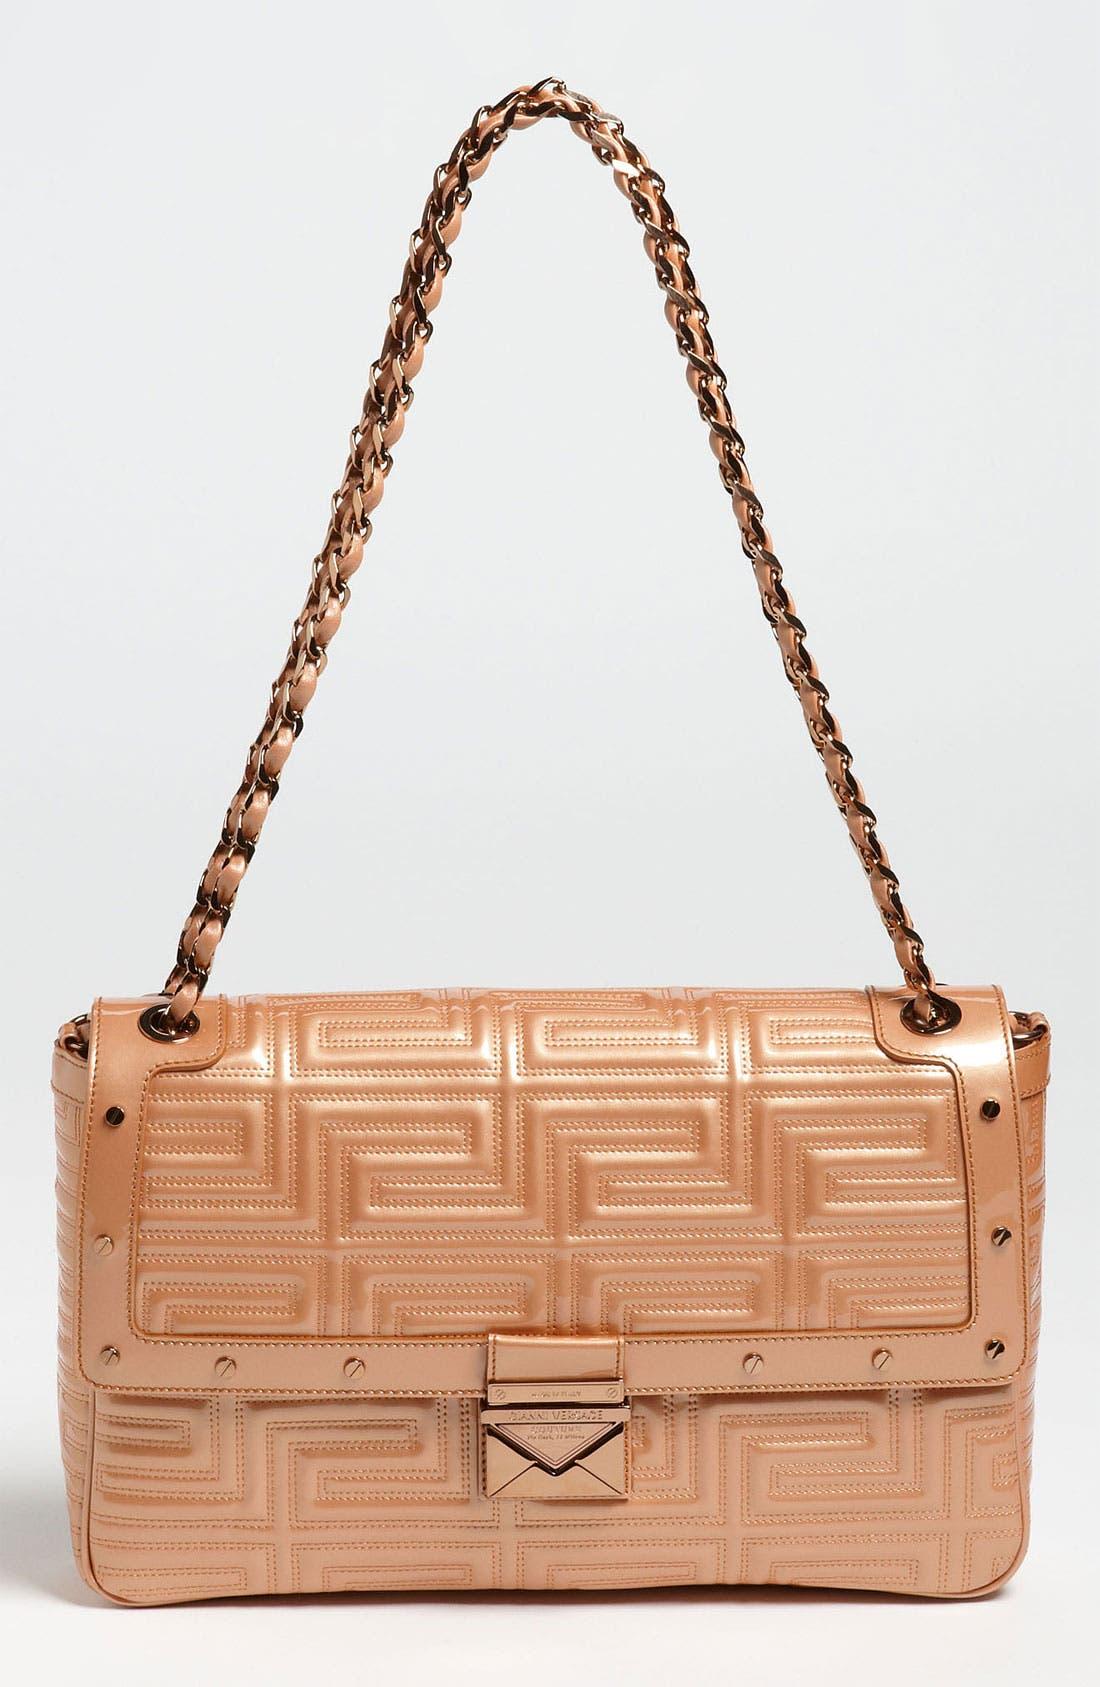 Main Image - Versace 'Large' Patent Leather Shoulder Bag